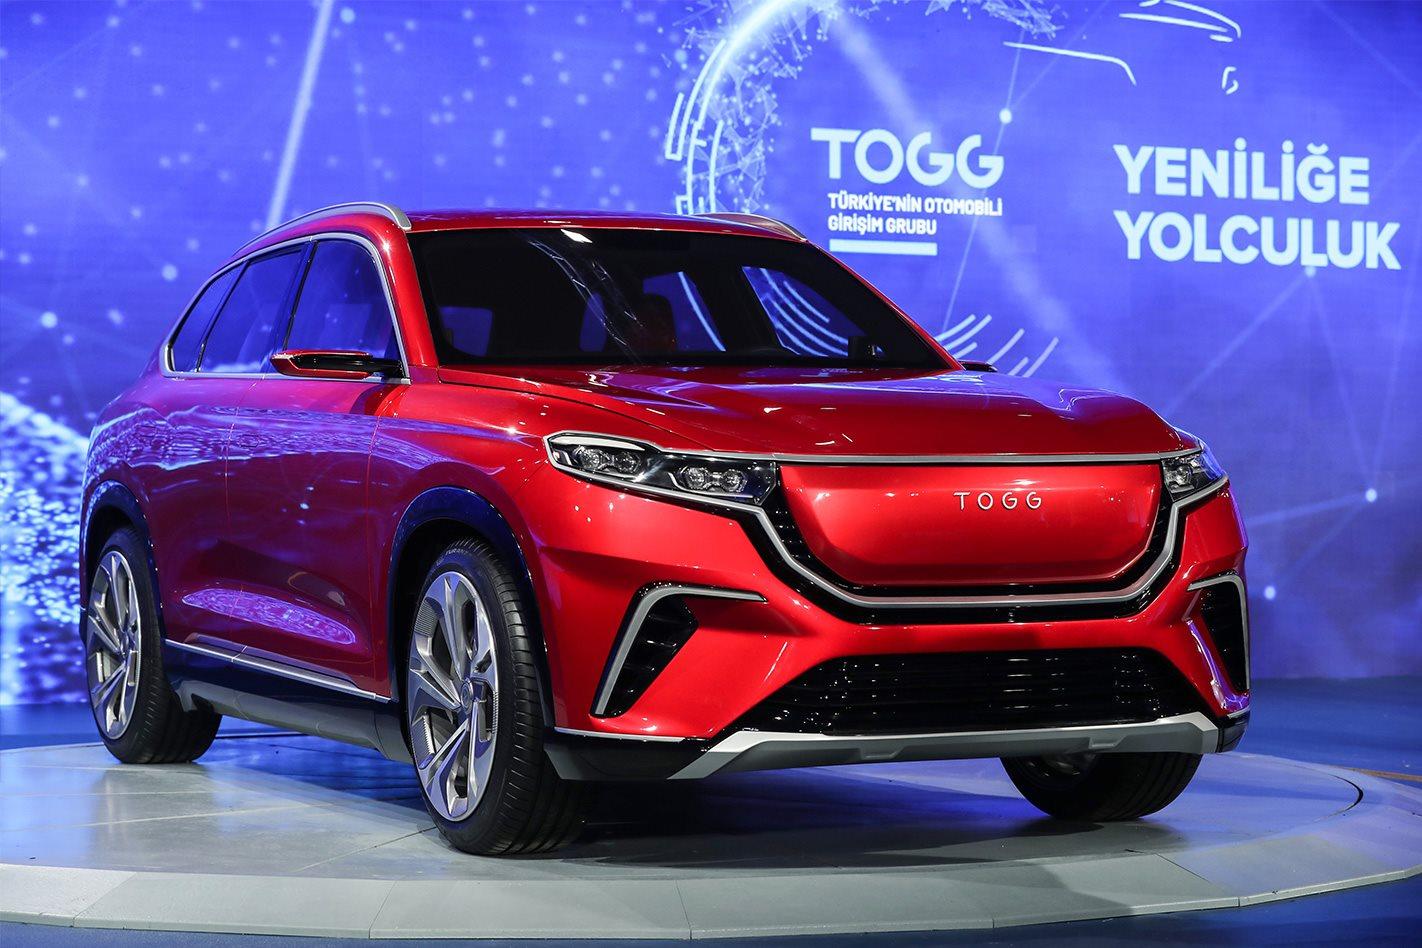 Turkish Tesla rival TOGG hopes to push Turkey onto global automotive stage